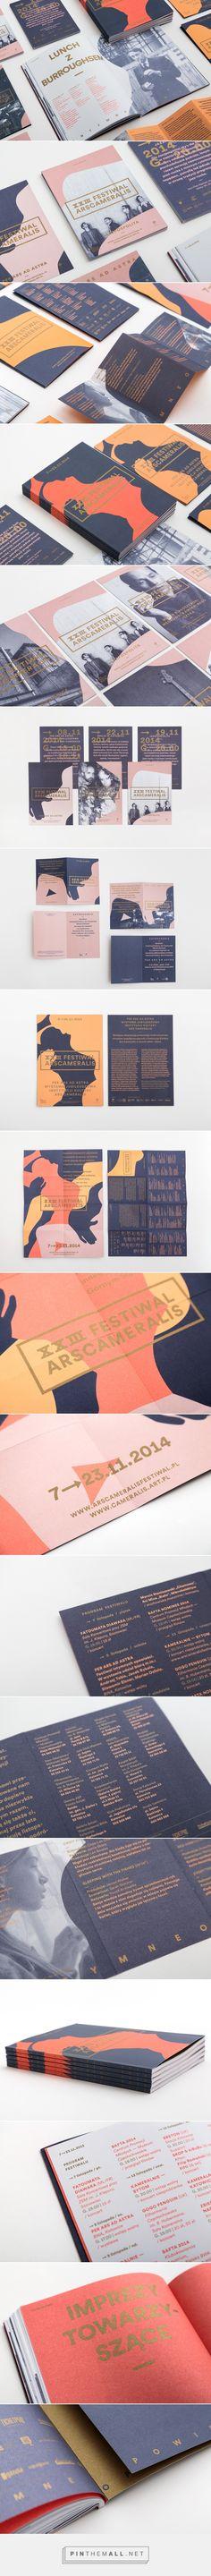 Ars Cameralis Festival 2014 on Behance - created via https://pinthemall.net